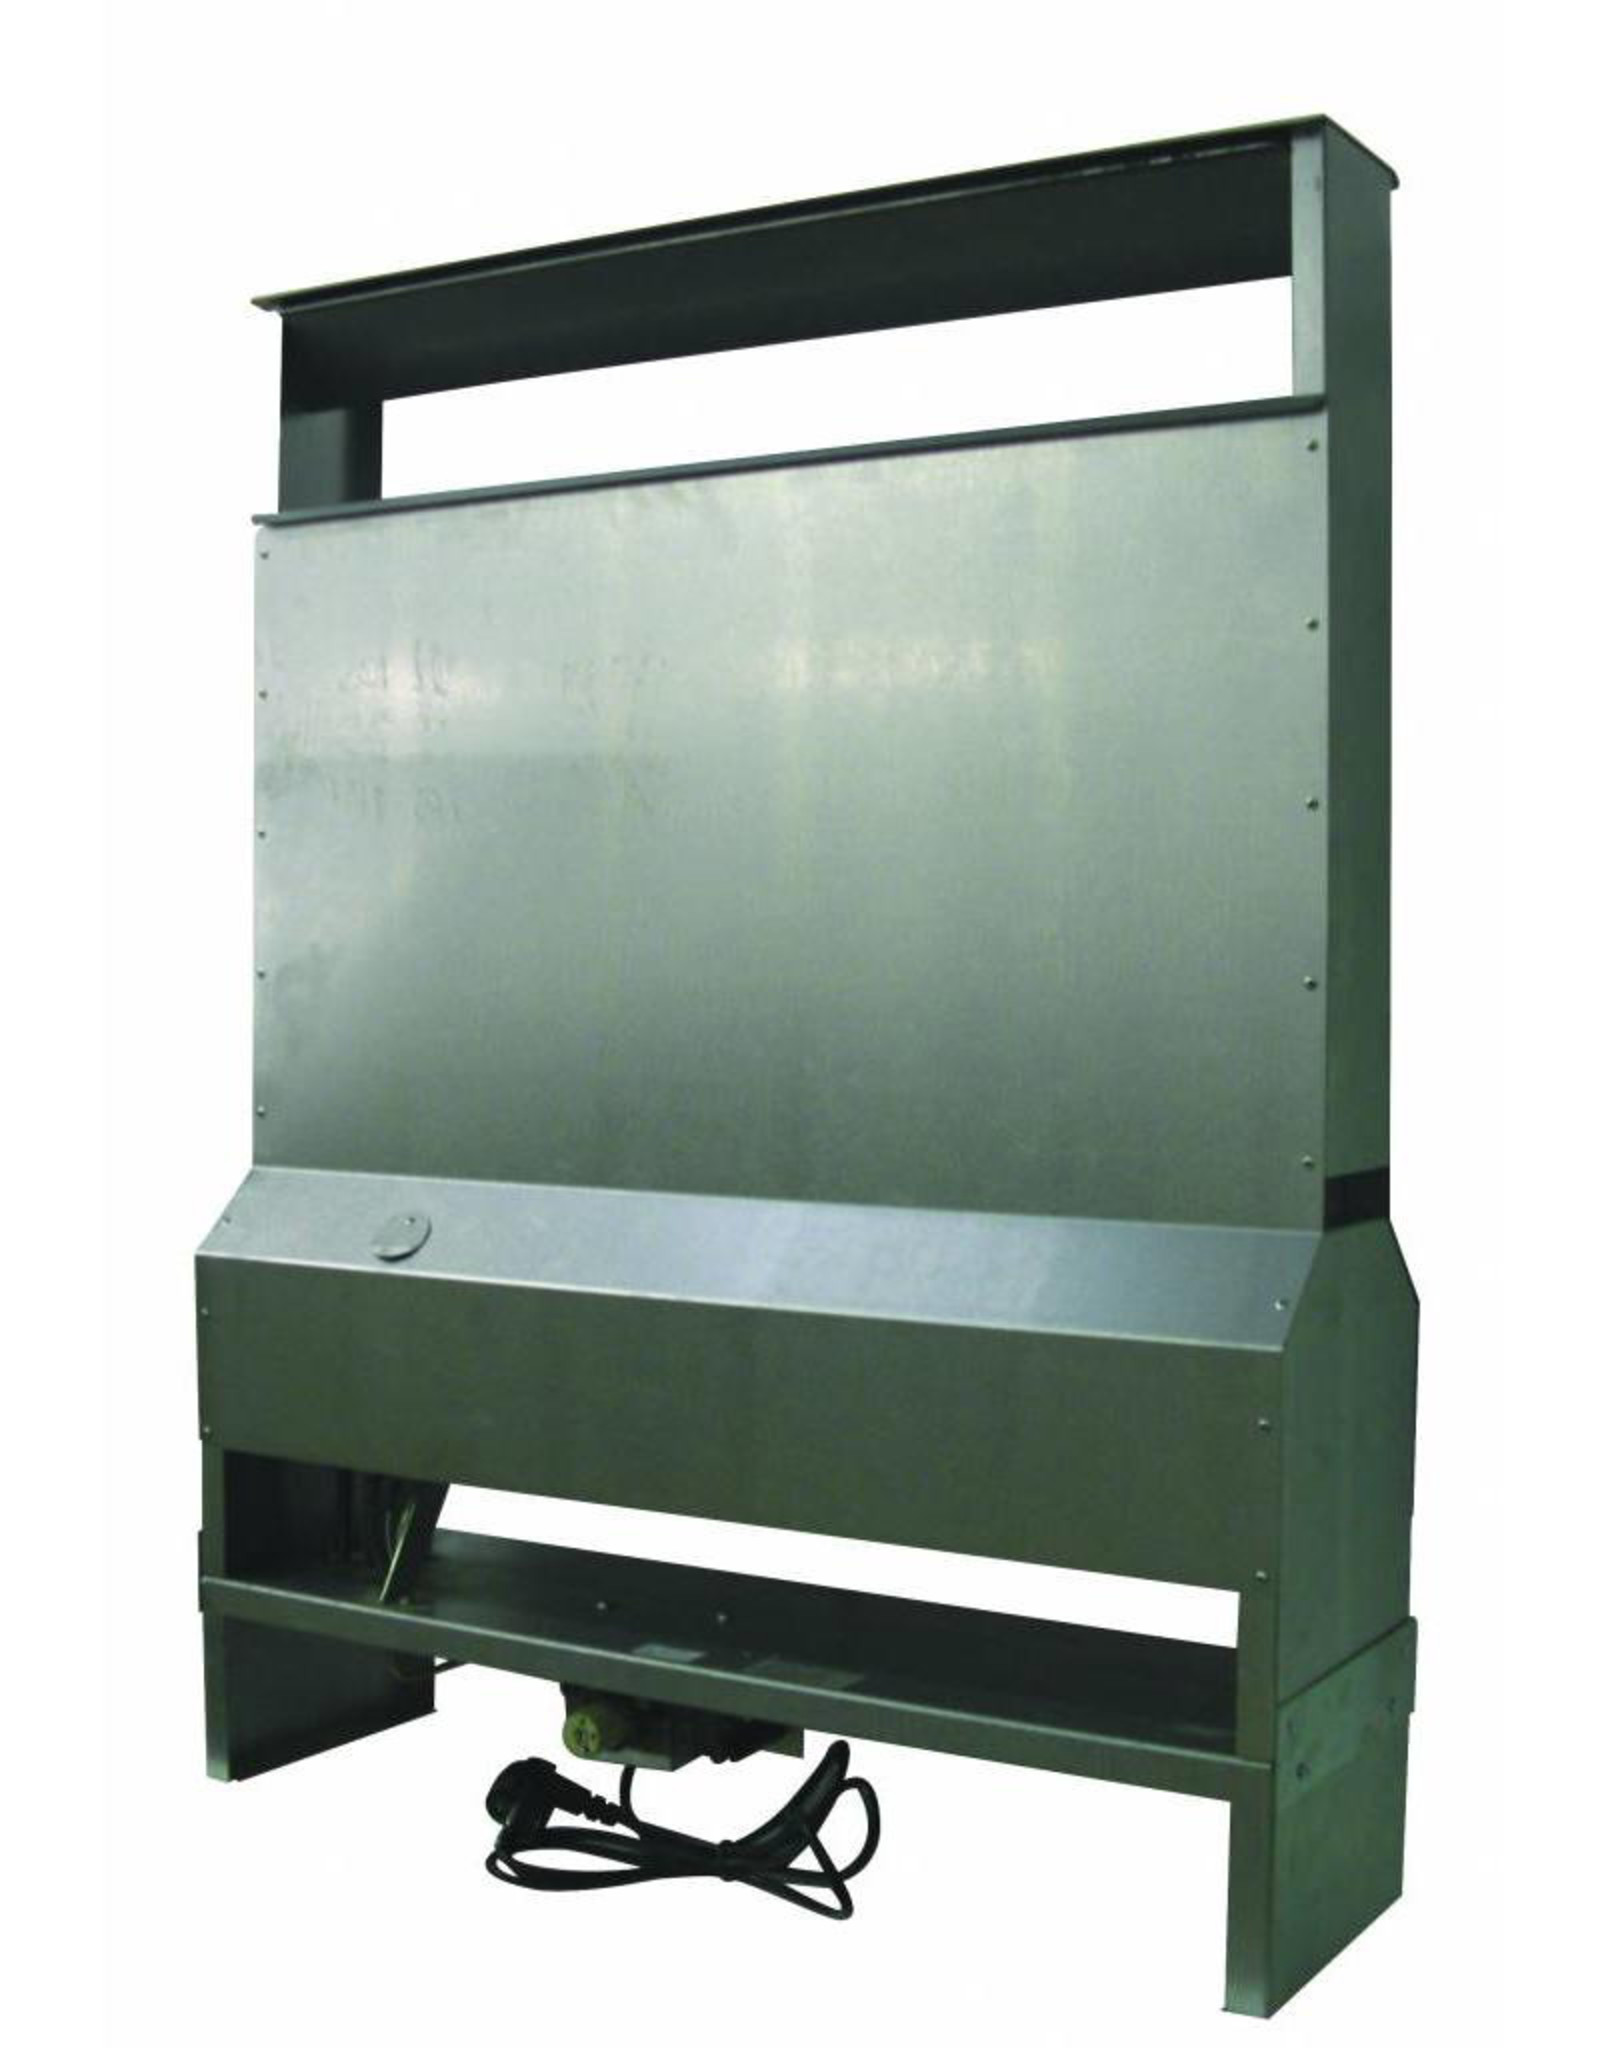 HOTBOX HOTBOX CO2 GENERATOR 11000WATT